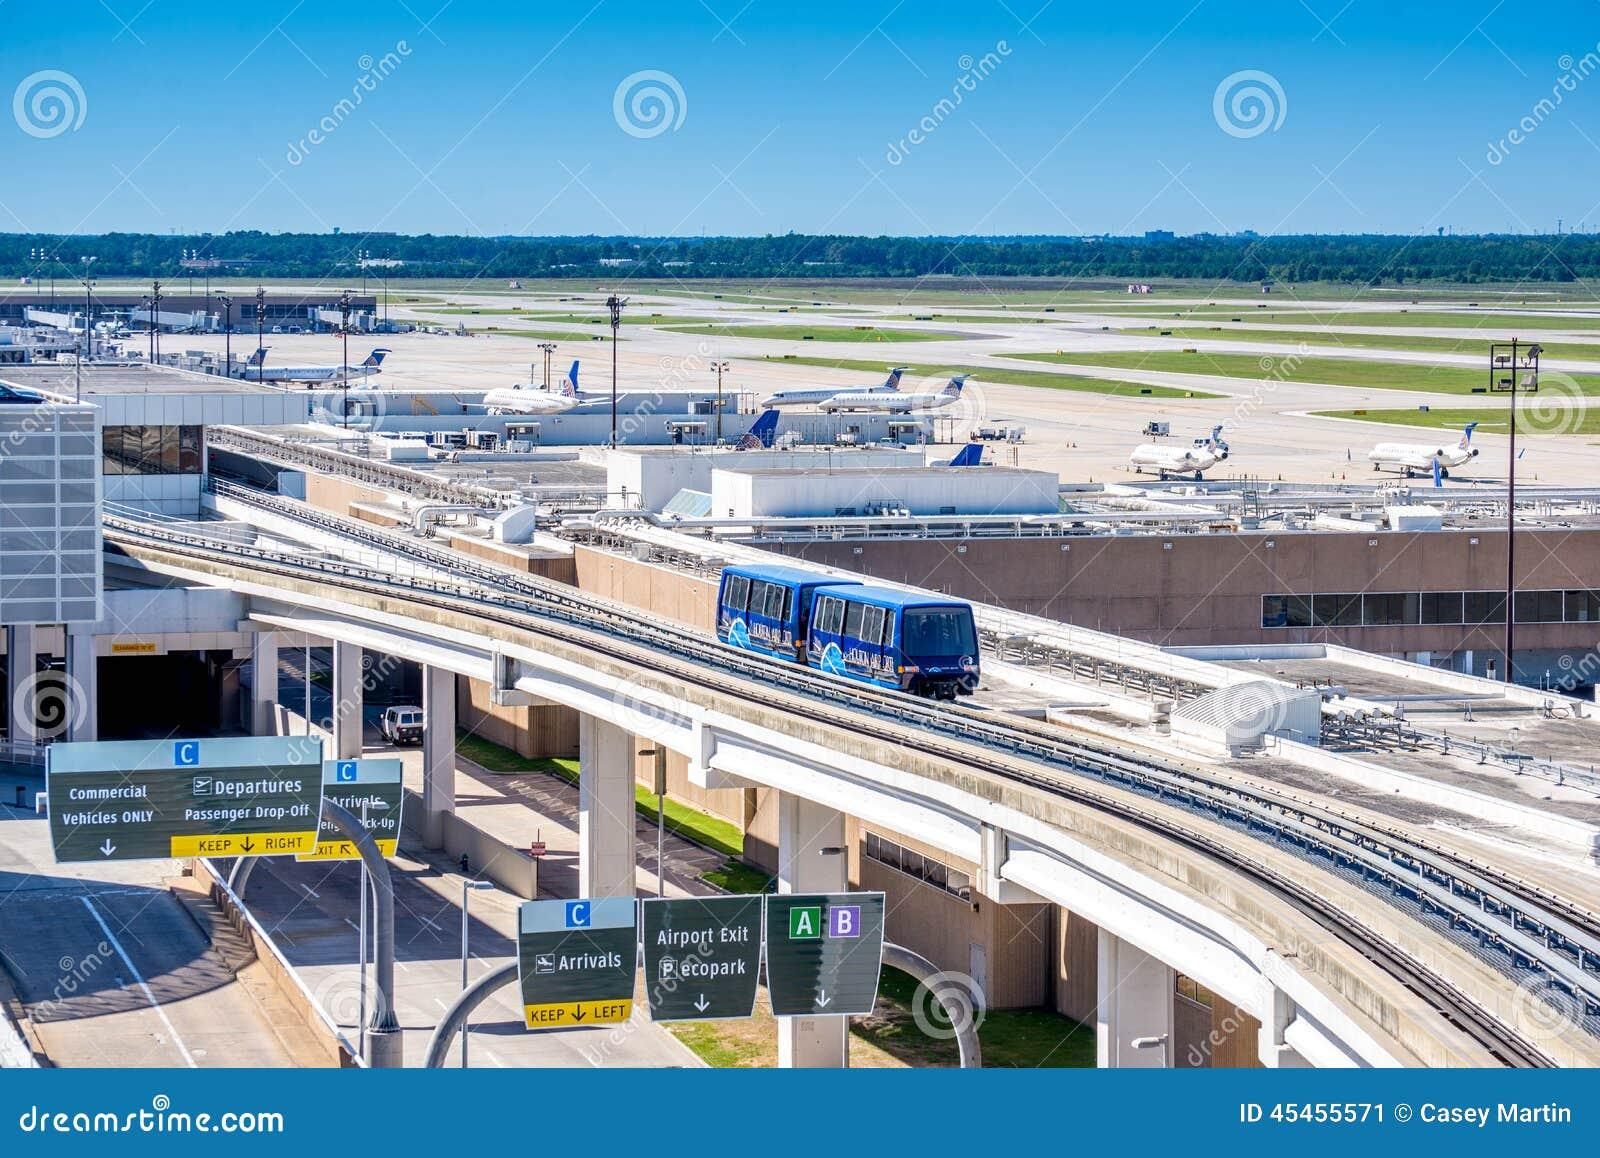 Houston Intercontinental Airport Car Rental